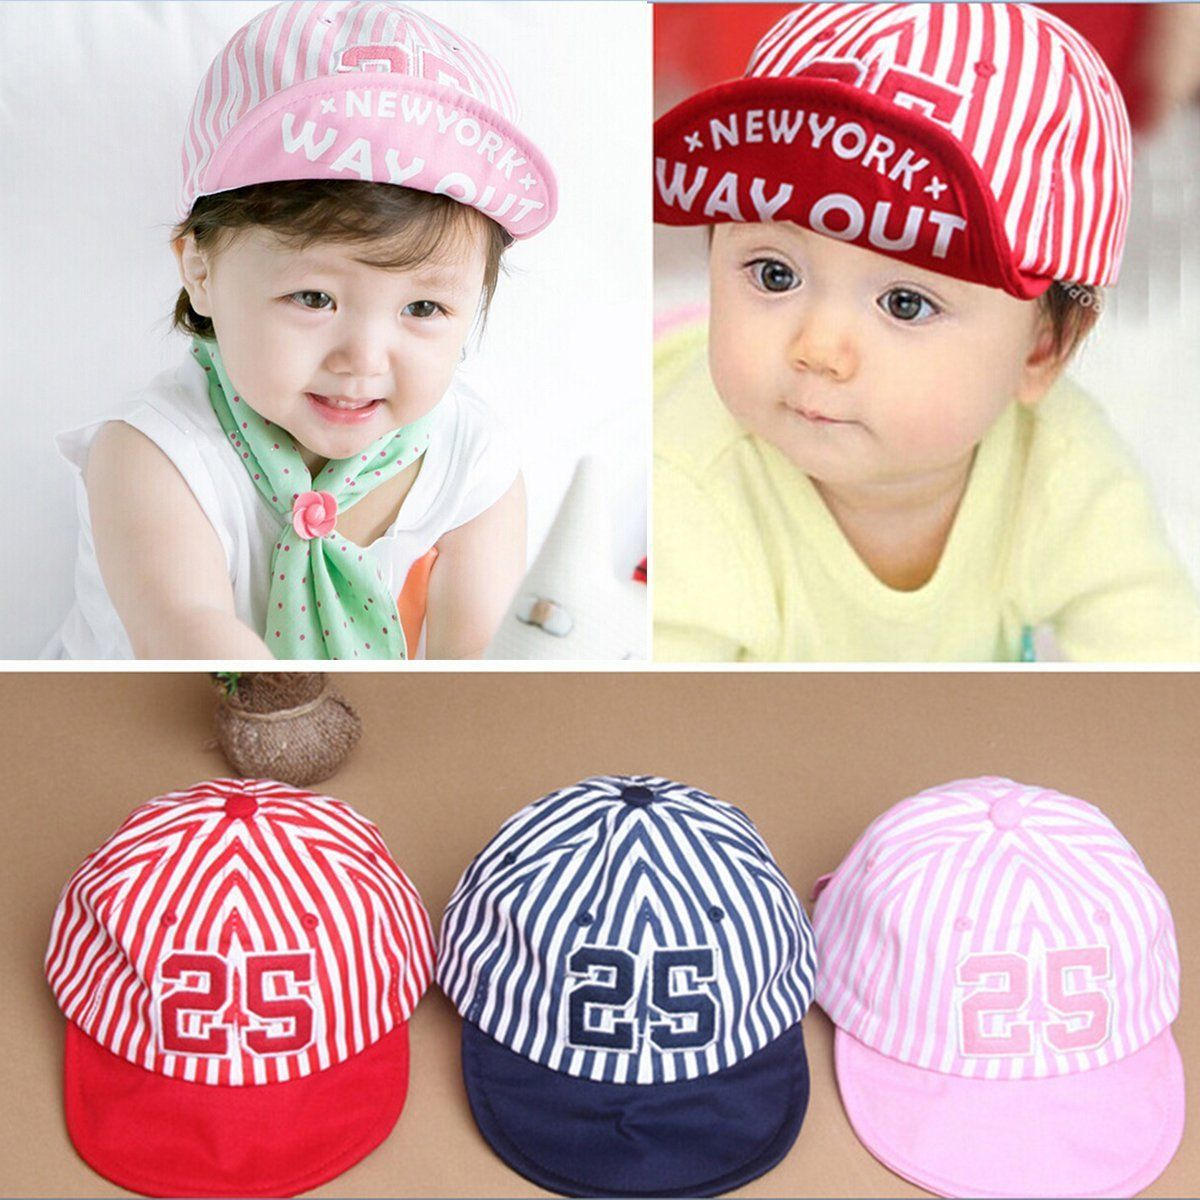 1.99 - Toddler Kids Cute Boys Girls Baby Infant Hat Casquette Peaked  Baseball Beret Cap  ebay  Fashion d8cd3704e4fb